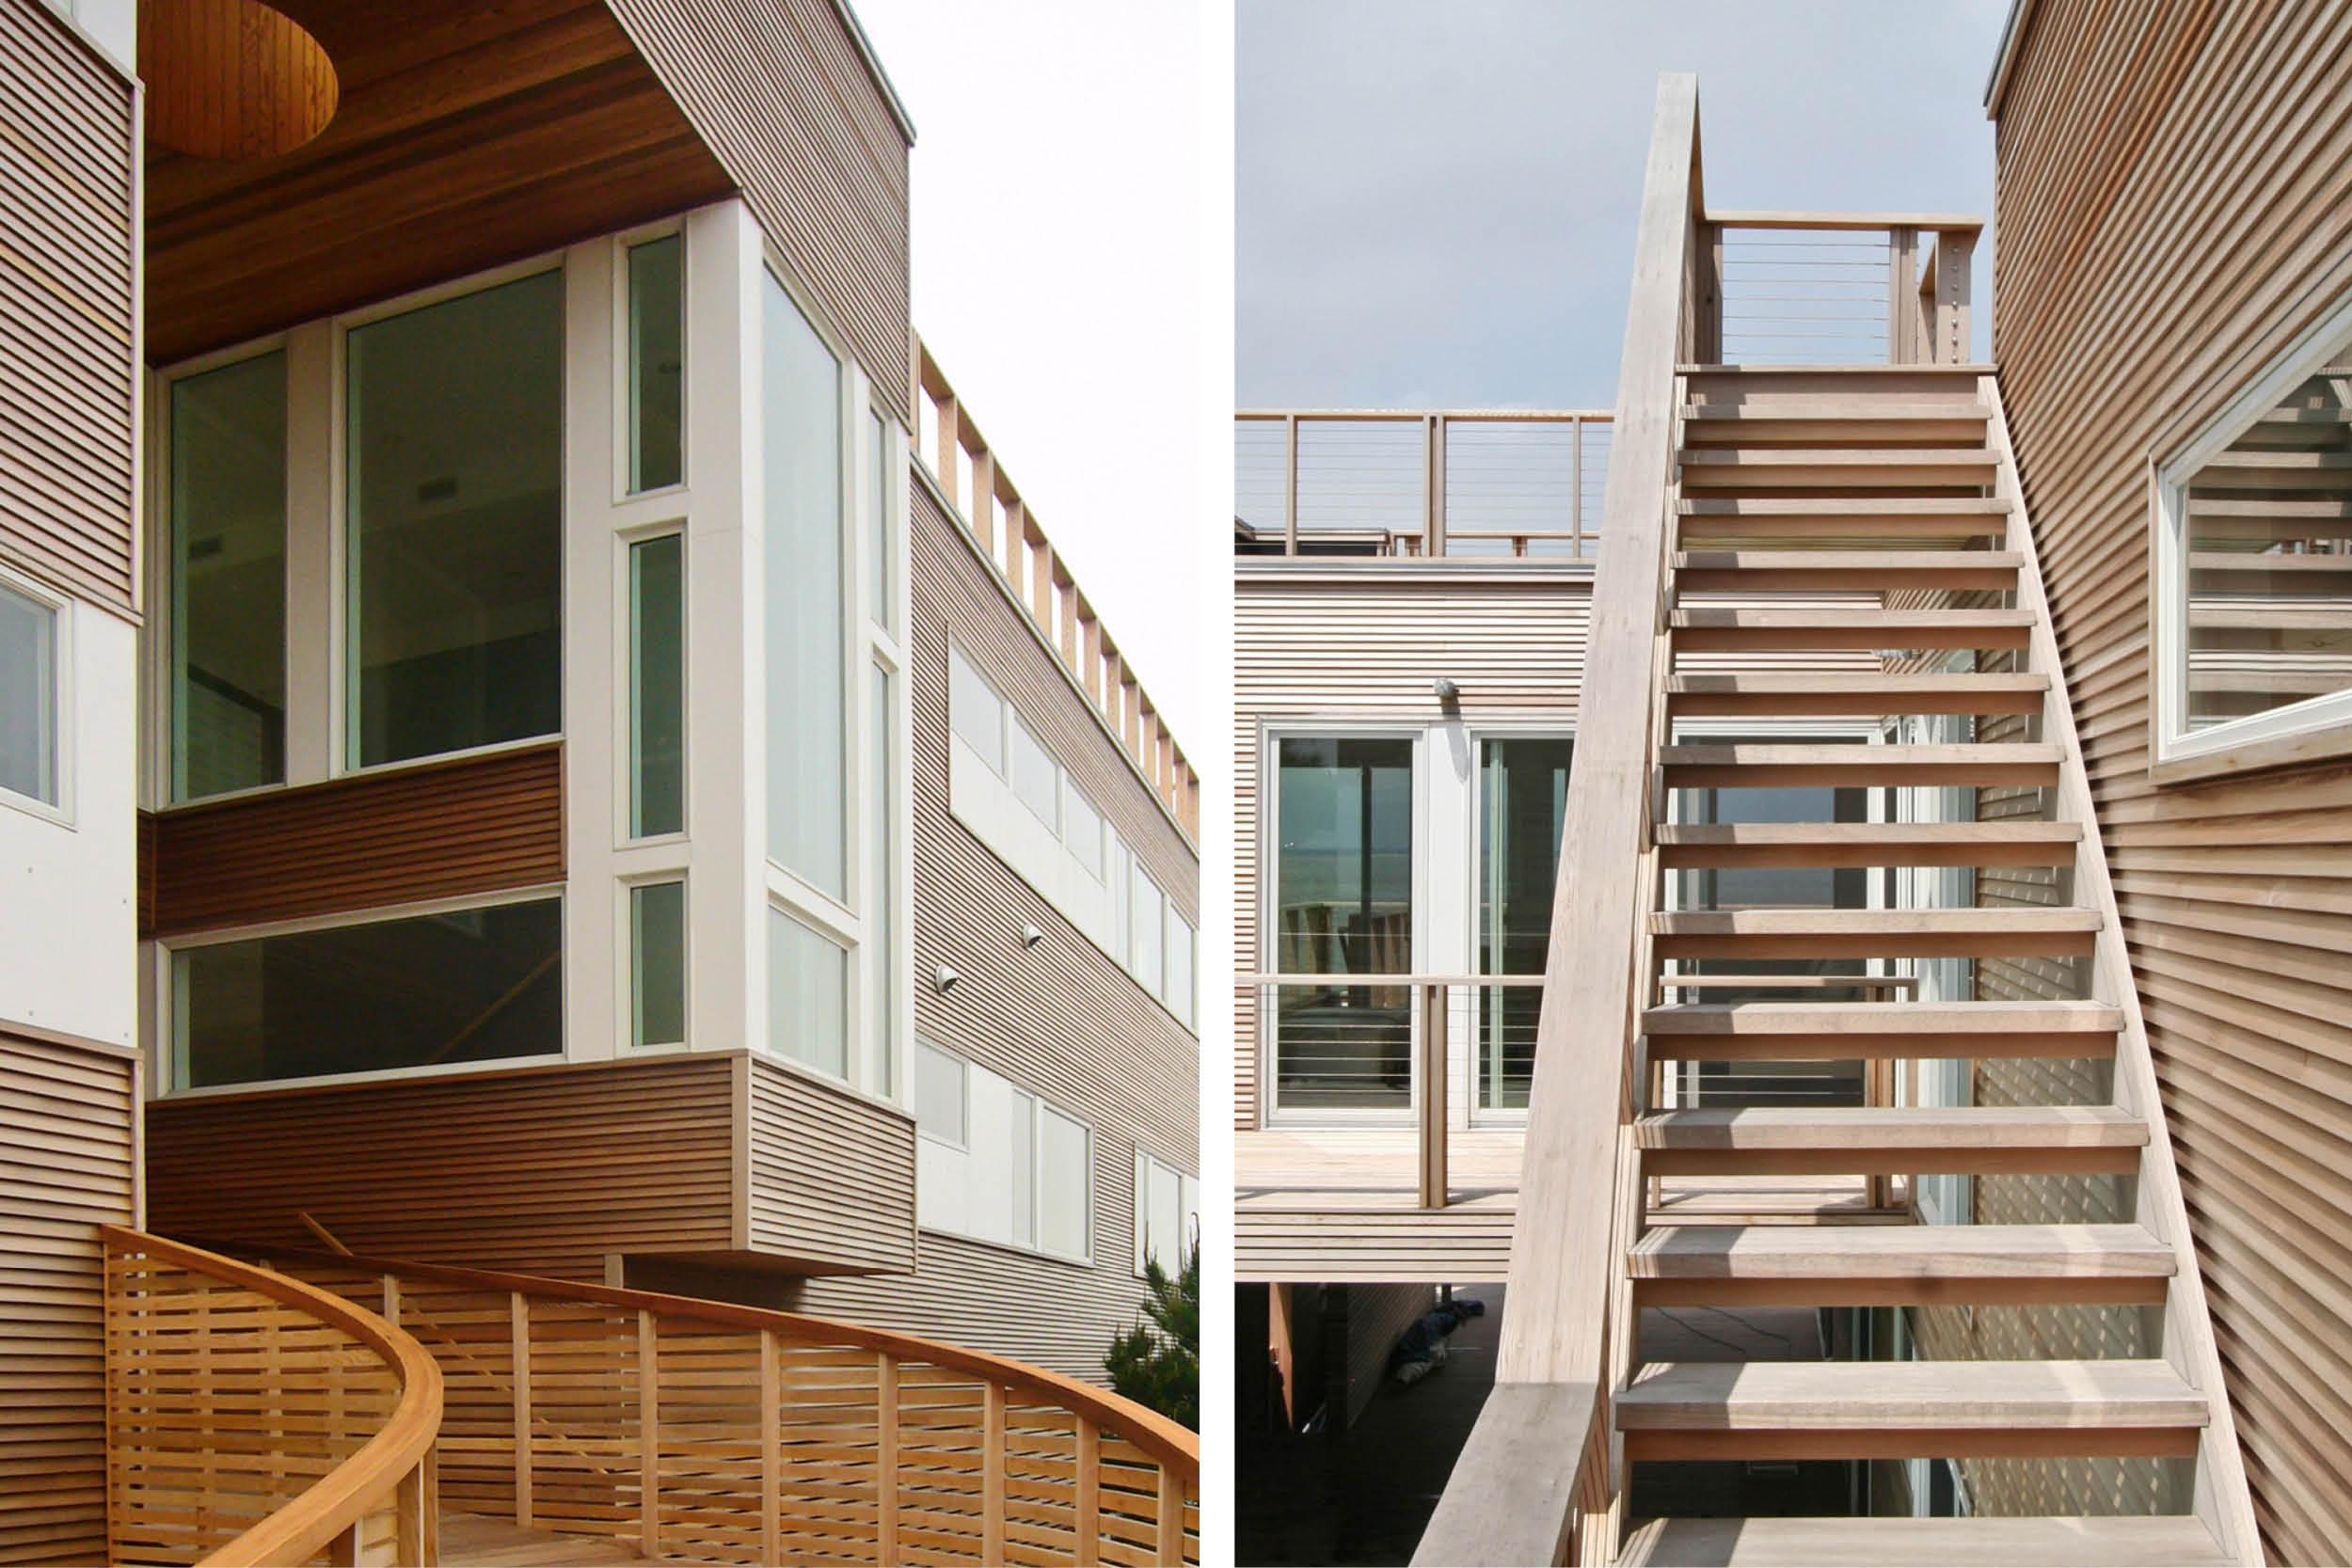 Modern Modular Prefab House | Cedar siding Beach White Windows Open Tread Stair | Fire Island New York | RES4